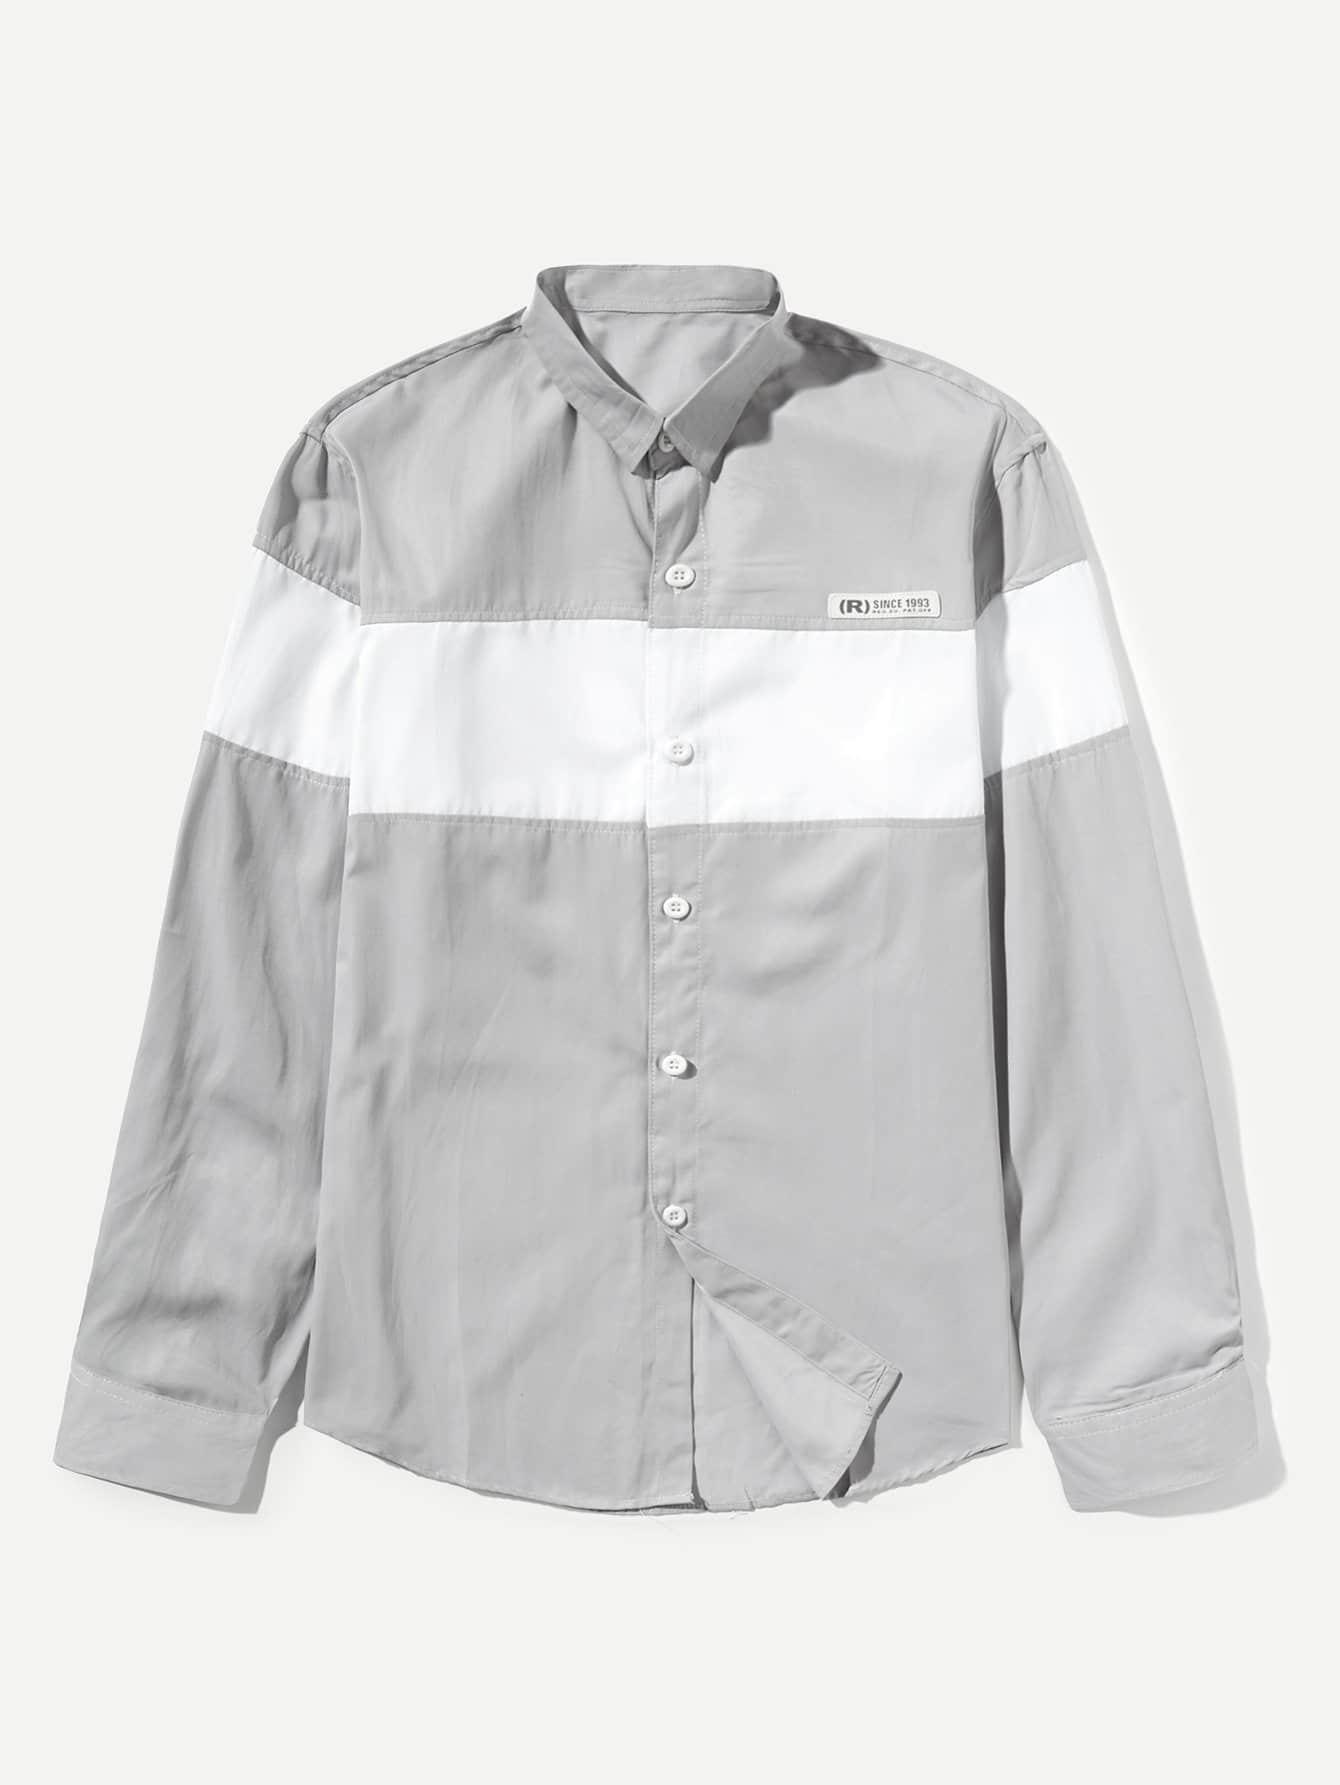 Men Curved Hem Colorblock Shirt Men Curved Hem Colorblock Shirt